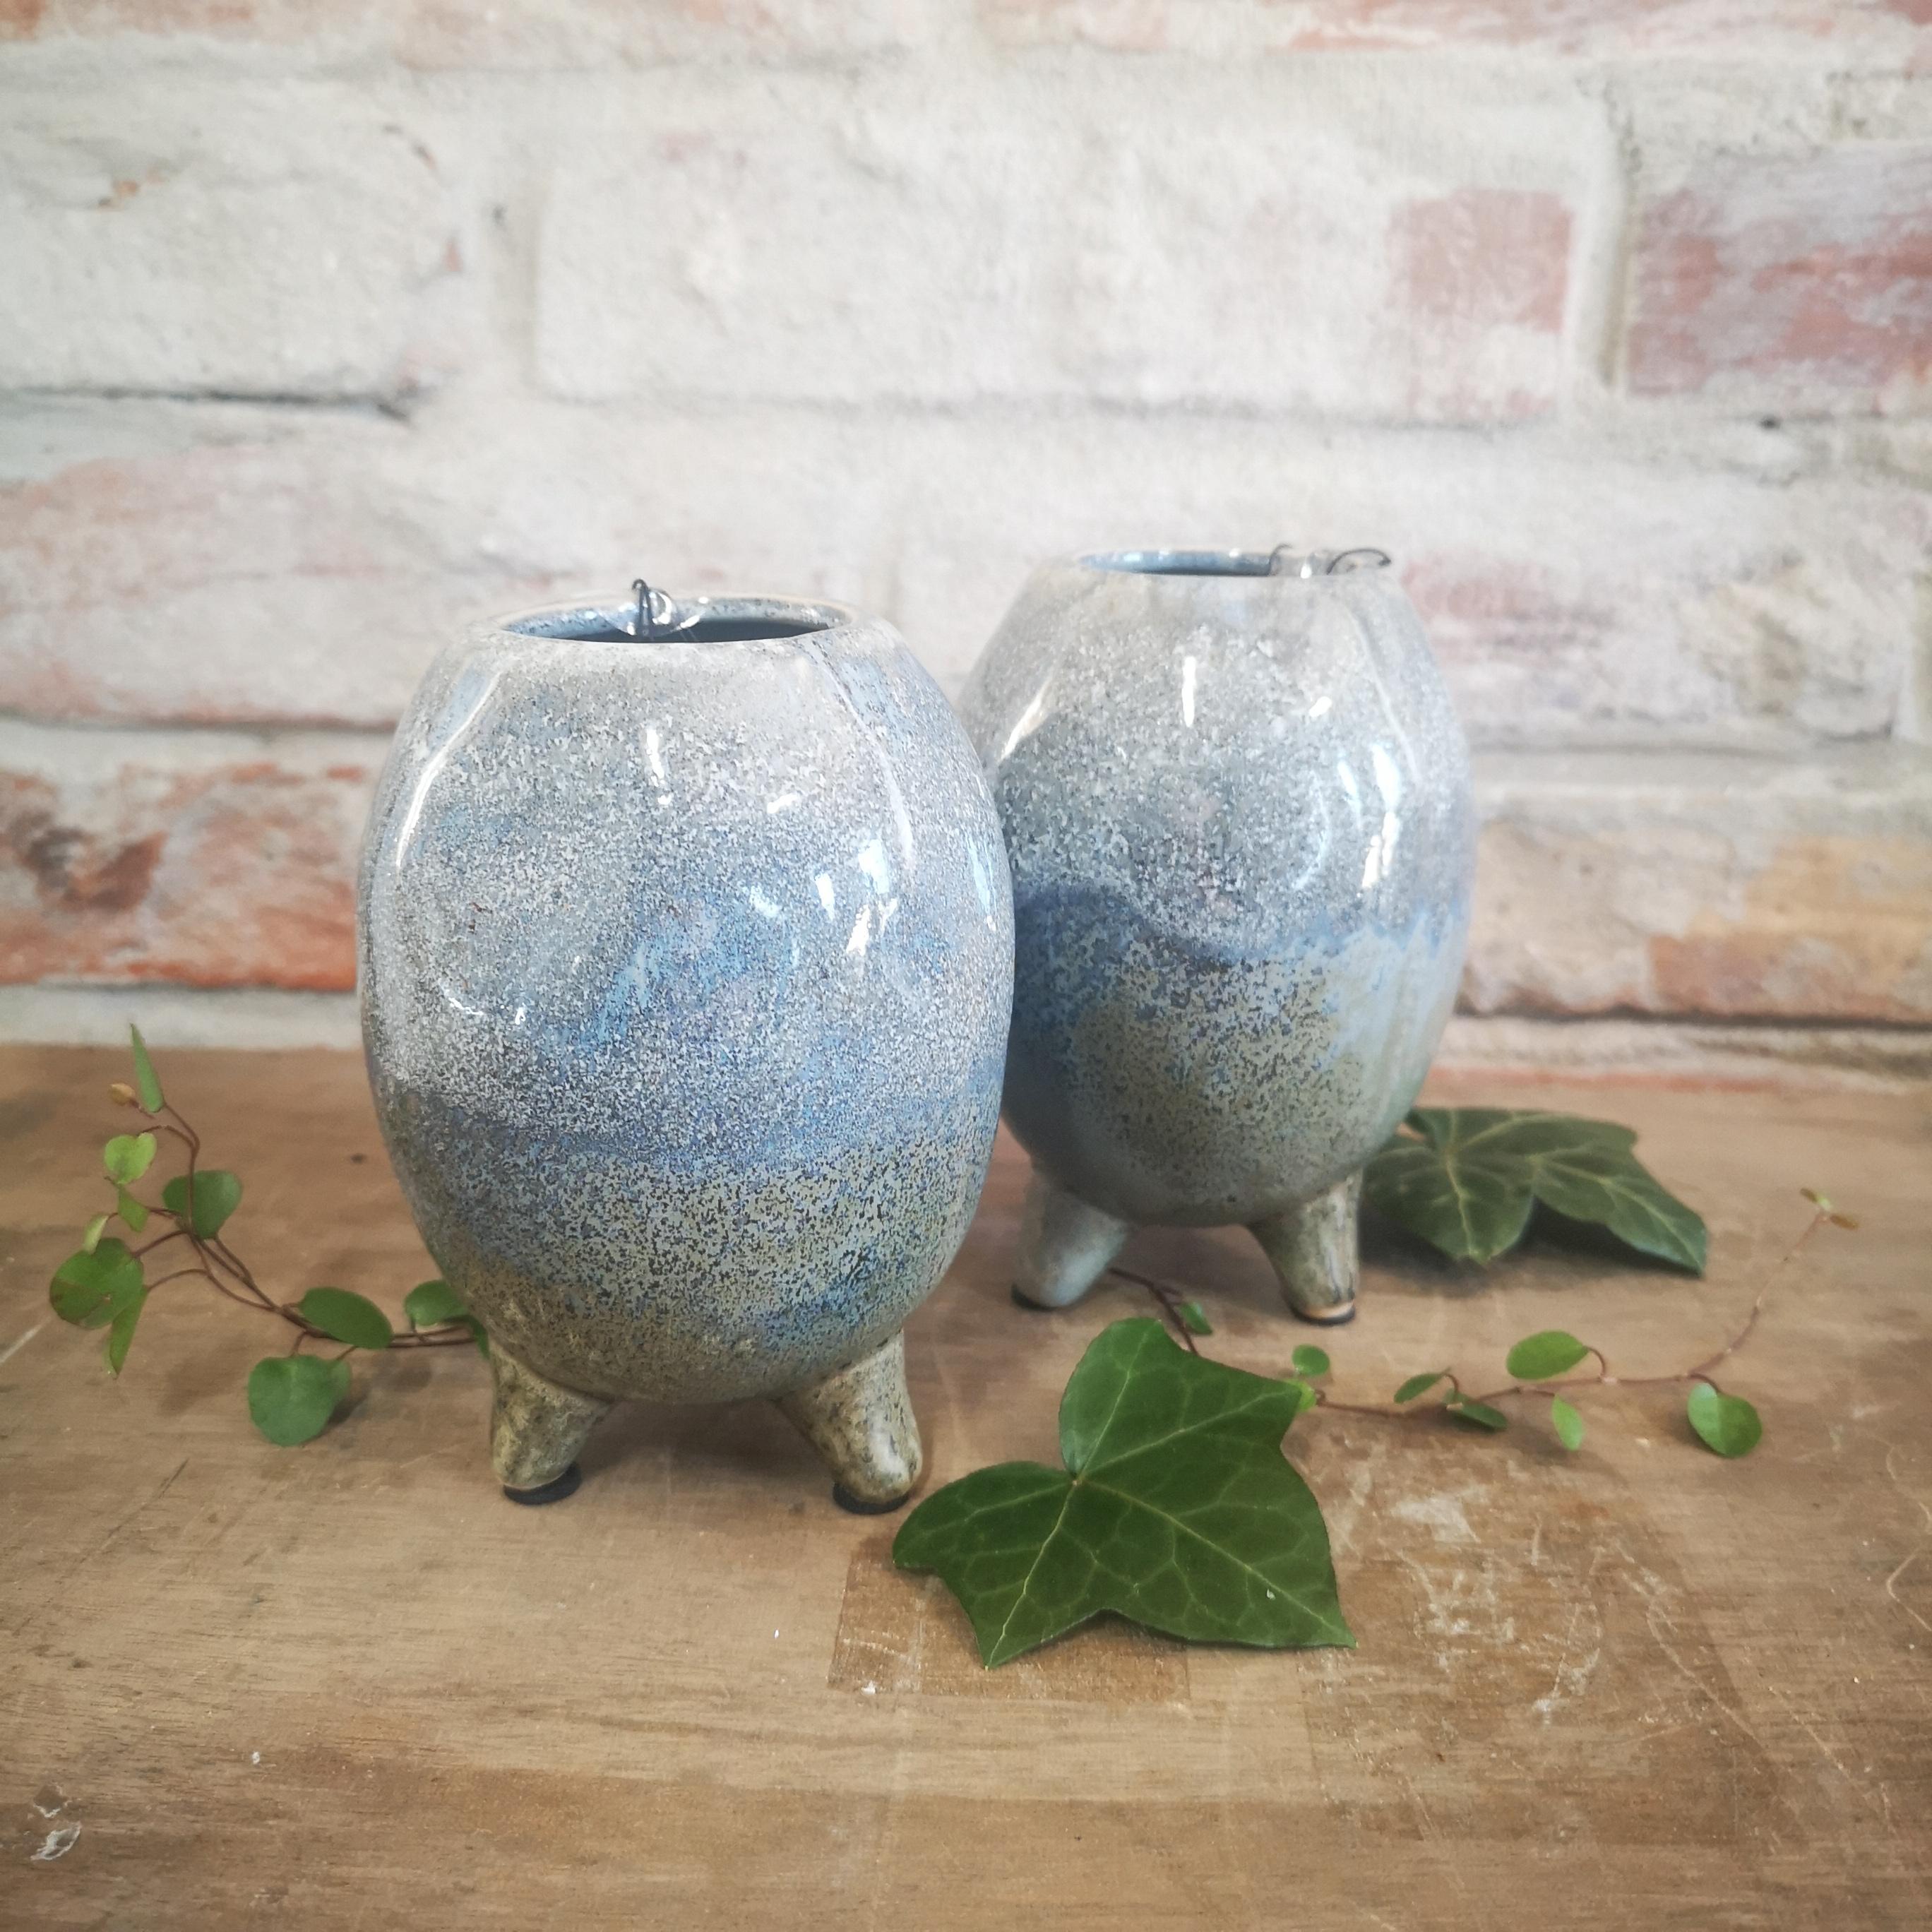 Keramik krukke på fod 12x8 cm